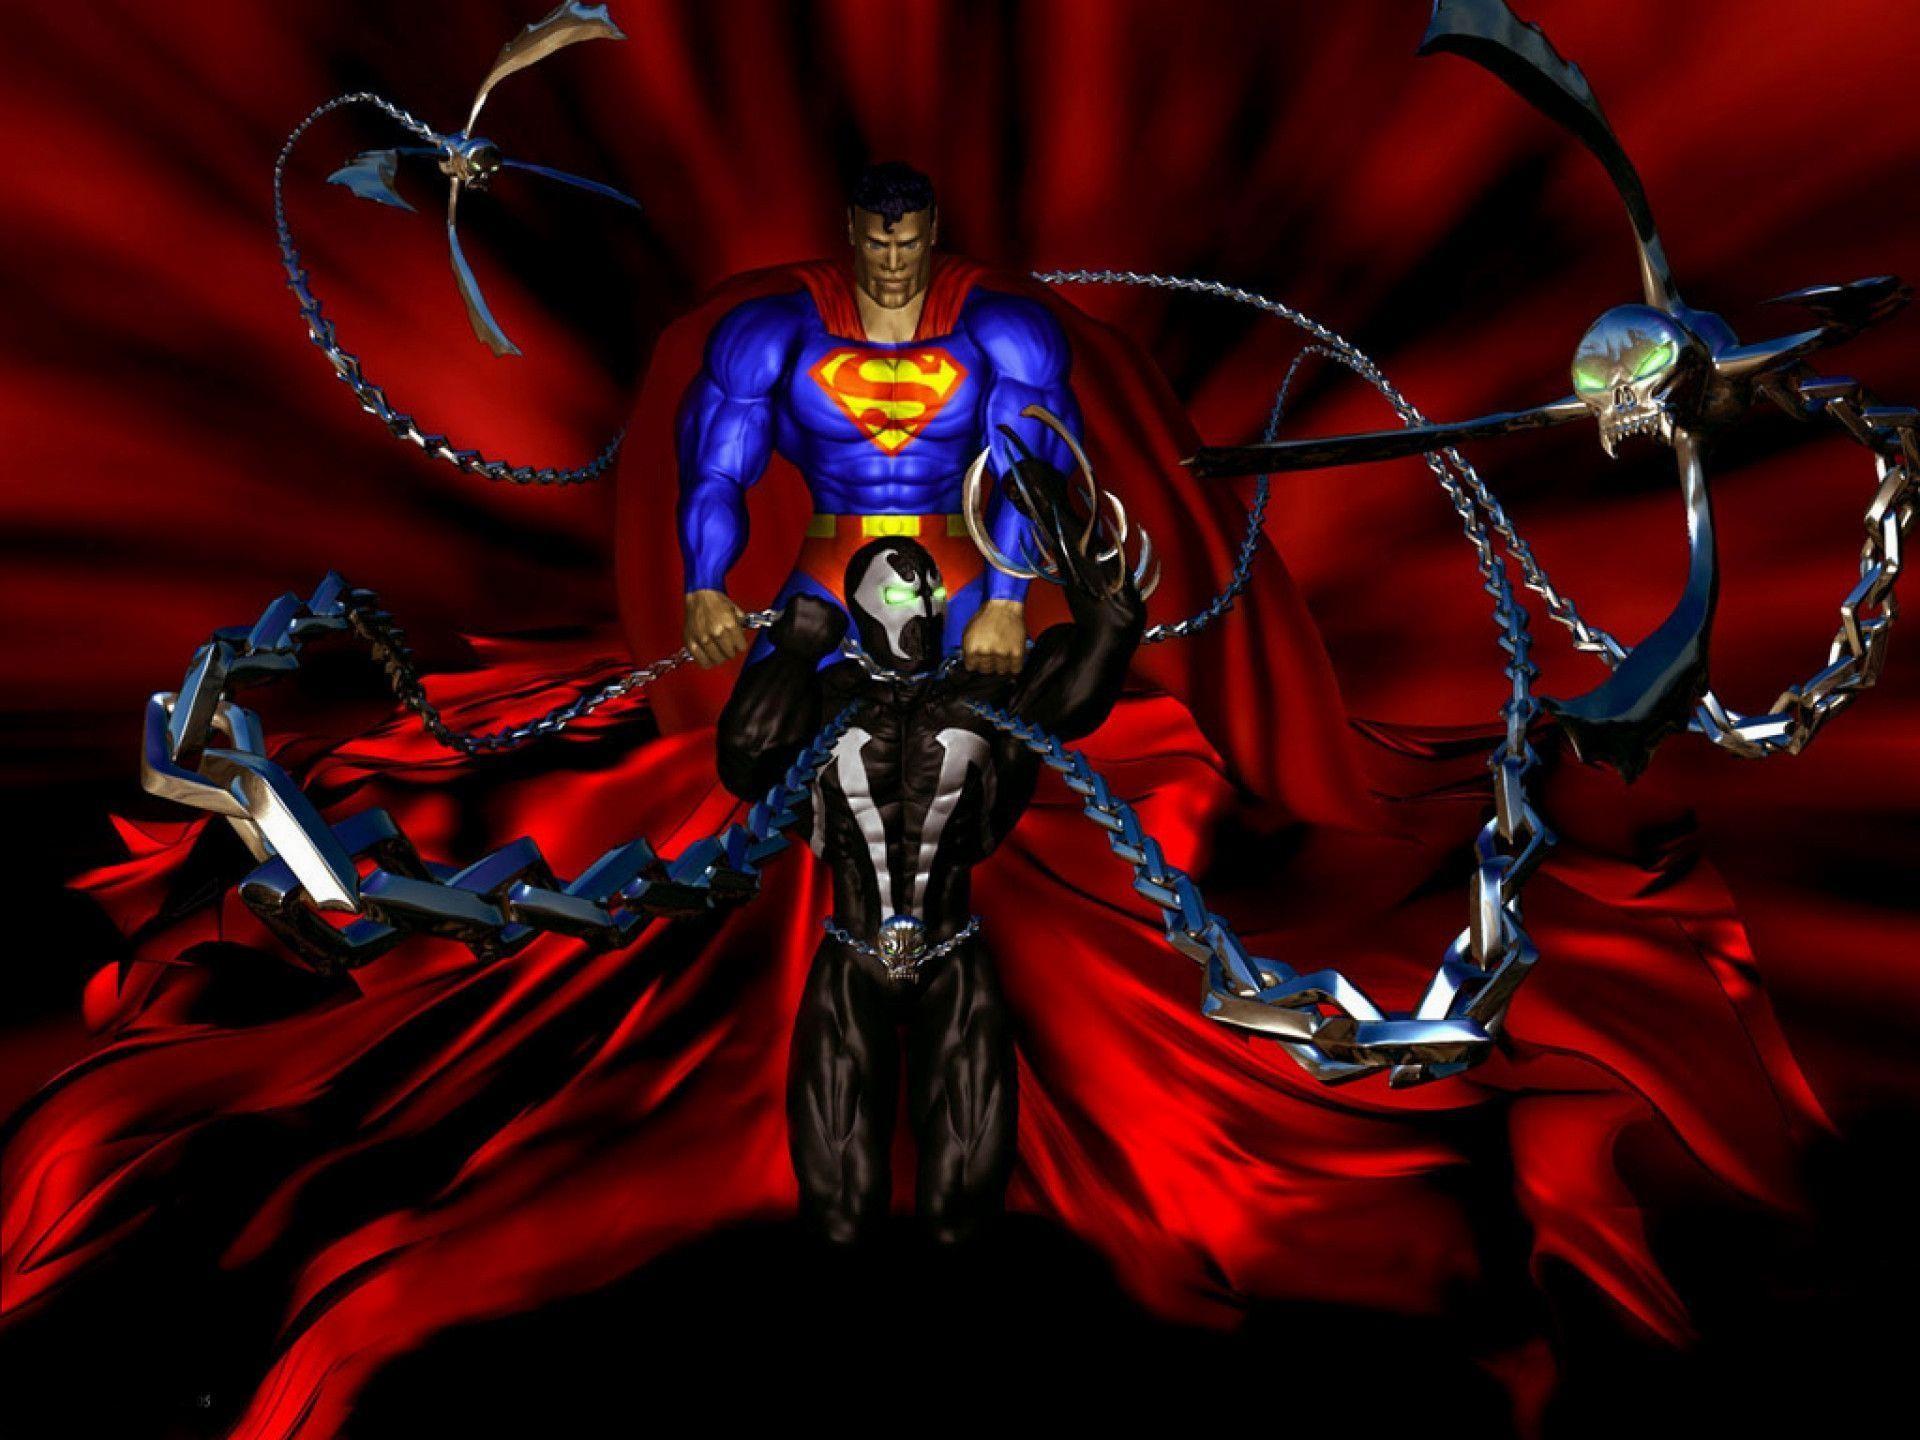 Superman-Wallpapers-1080p